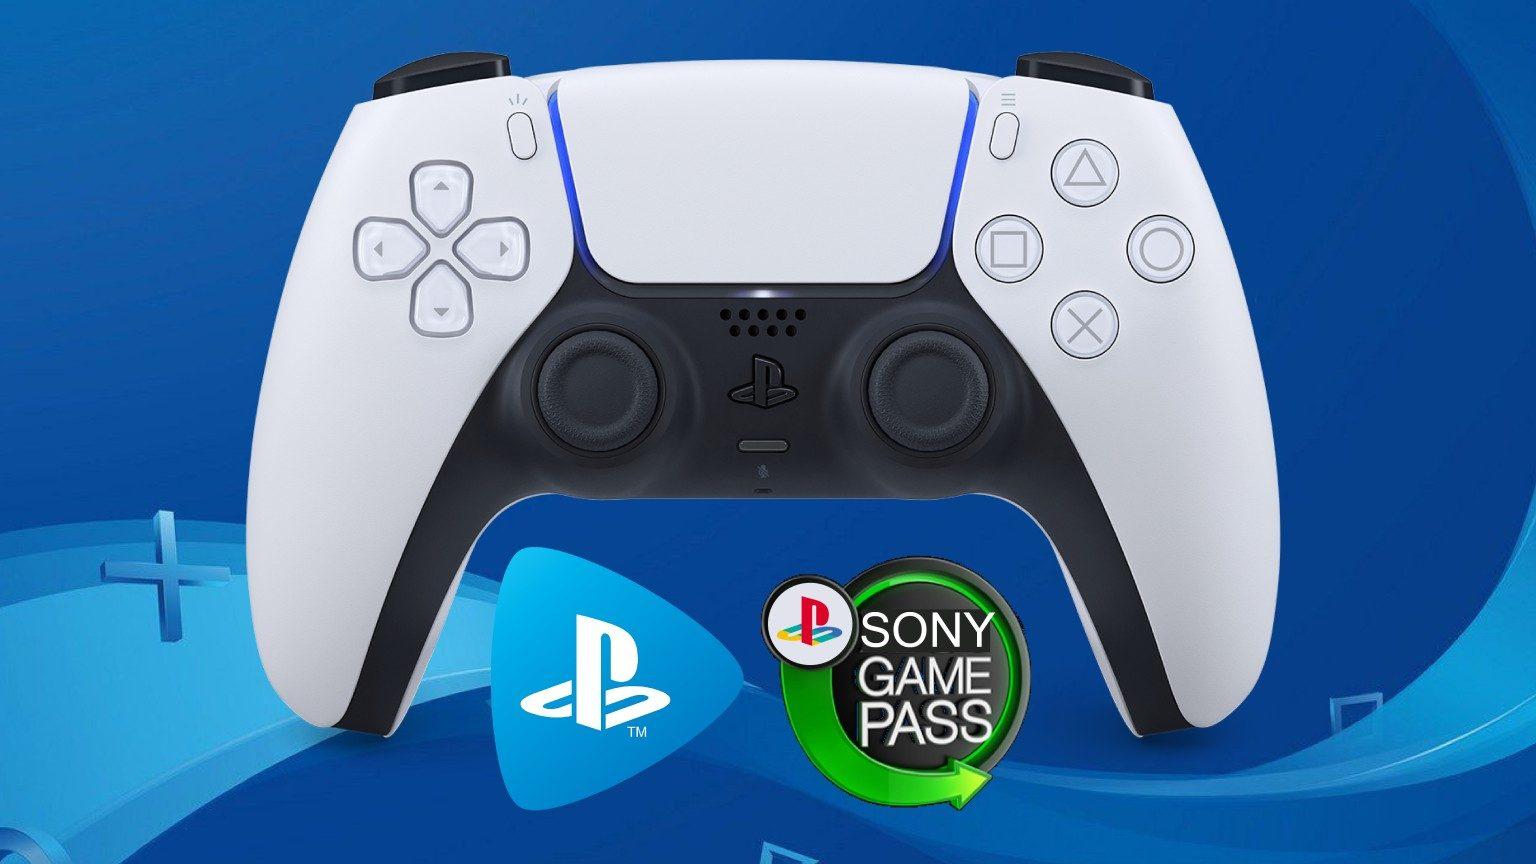 Sony Game Pass M